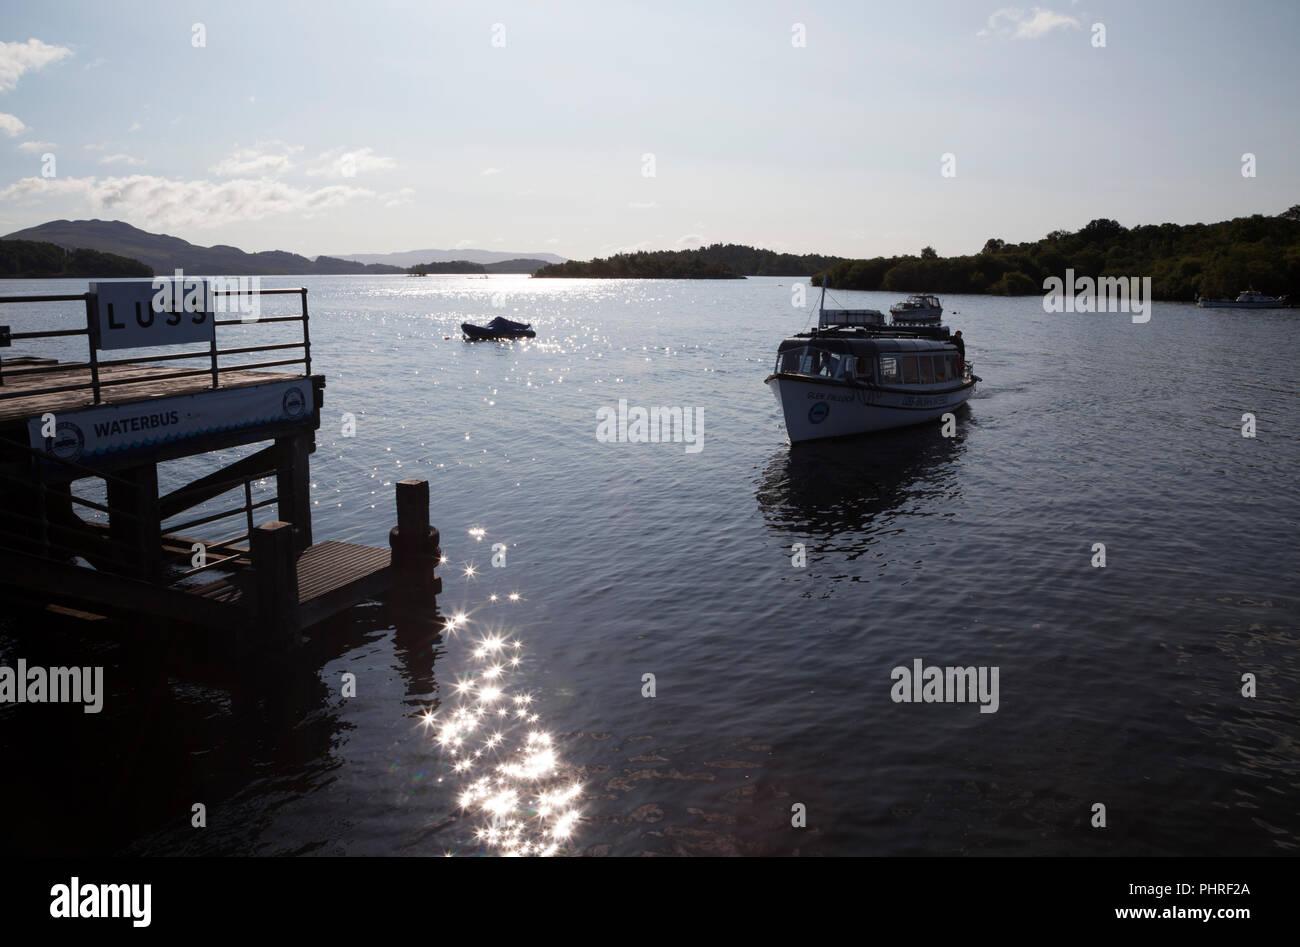 Waterbus approaching Luss pier, Loch Lomond, Scotland, shot into the sun. - Stock Image